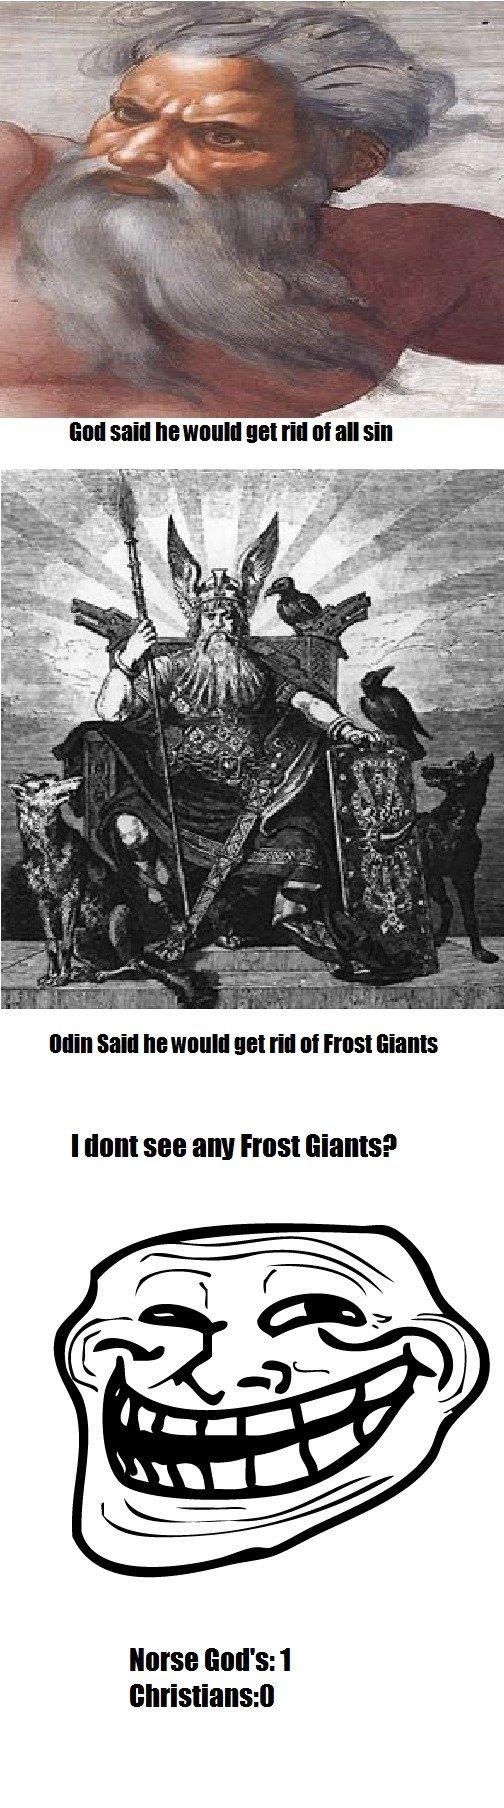 Norse God's. 100% Oc. J. rfi. libi. 100% repost Norse God's 100% Oc J rfi libi repost